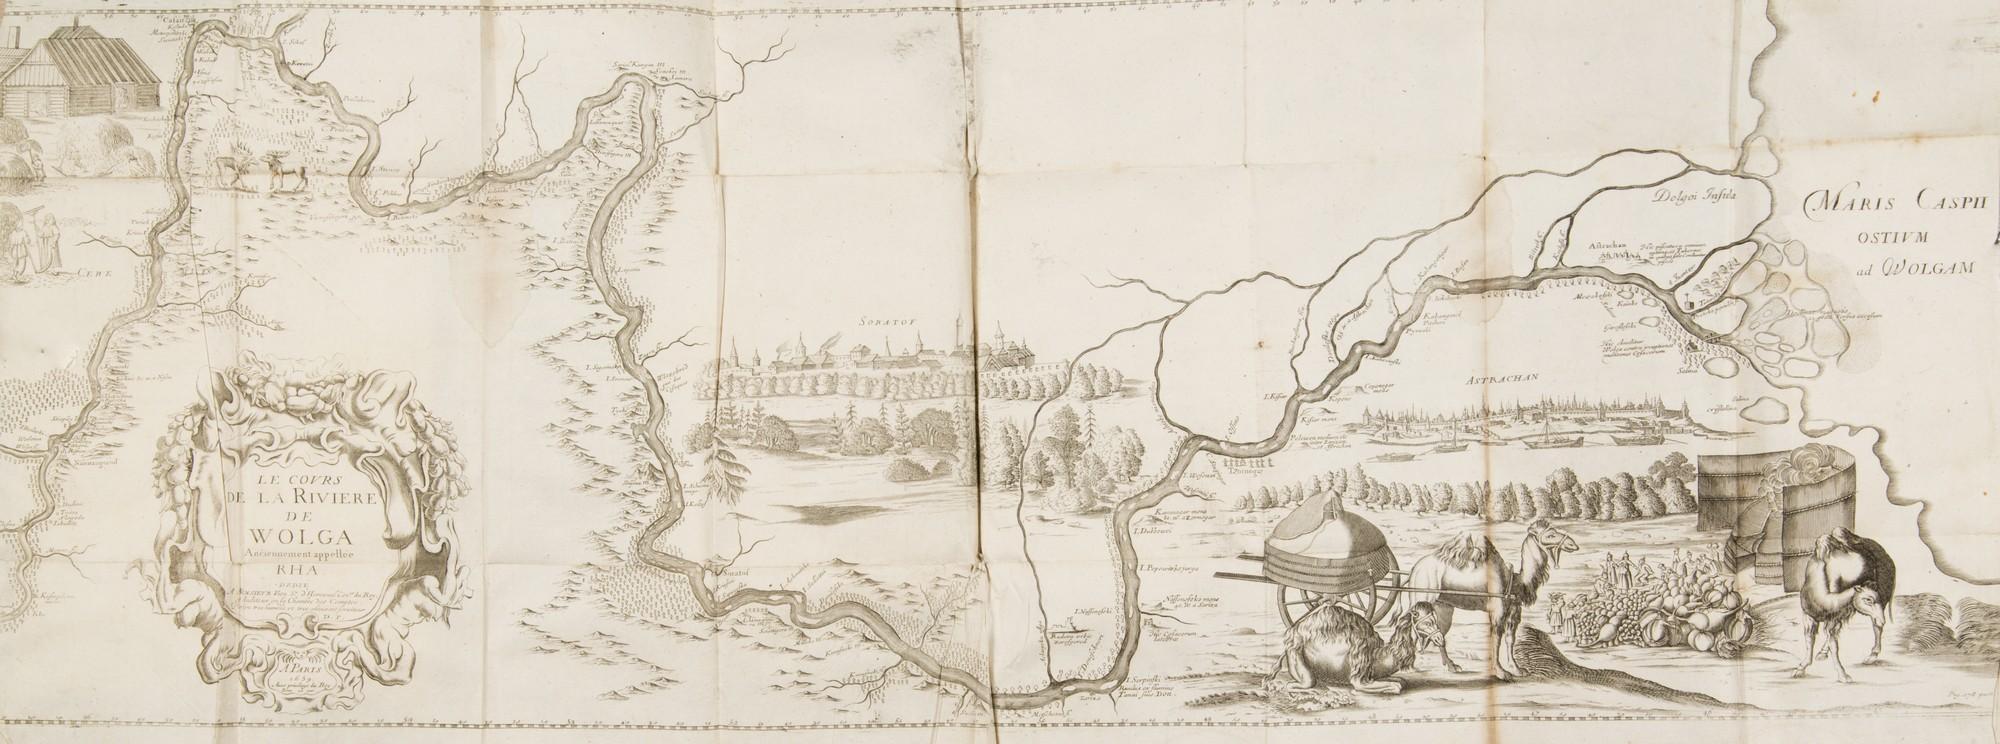 Adam Olearius, Relation Du Voyage D'Adam Olearius En Moscovie, Tartarie, Et Perse, A Paris, 1679 – mapa Wołgi, fot. MNK (źródło: materiały prasowe organizatora)